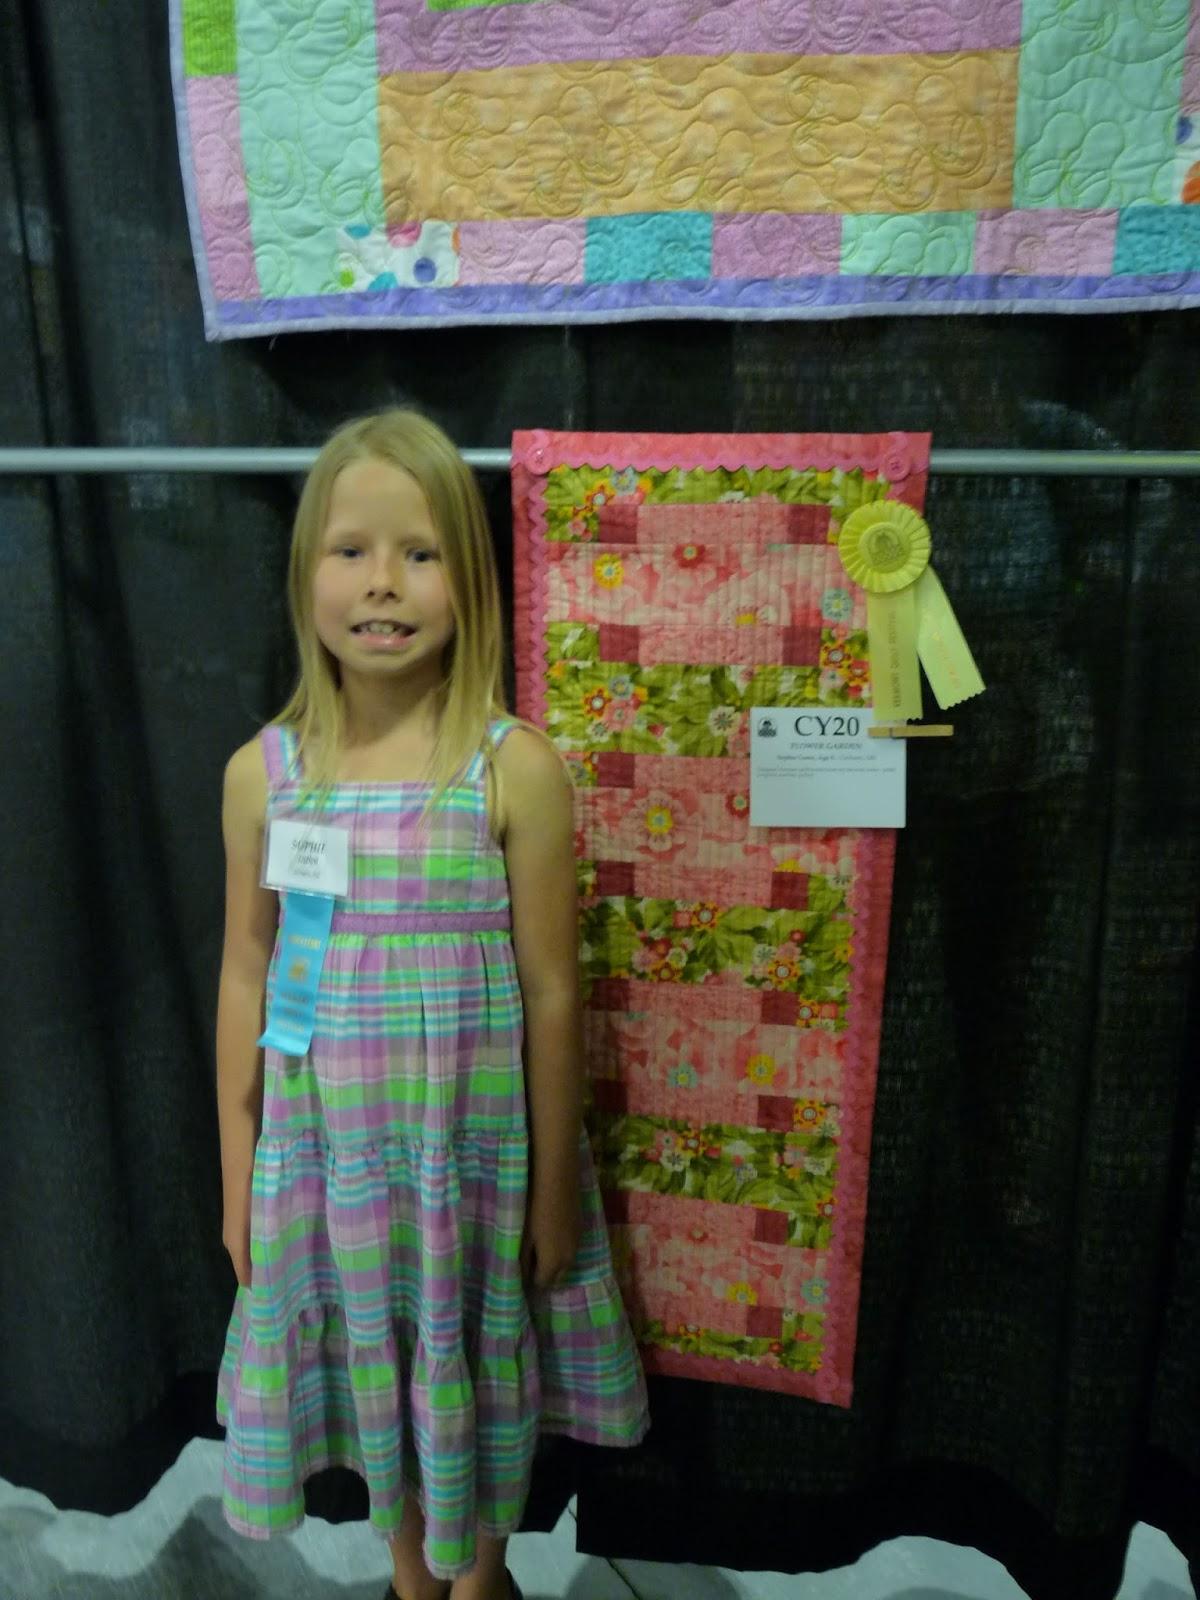 Sewing & Quilt Gallery: Vermont Quilt Show : quilt shops in vermont - Adamdwight.com